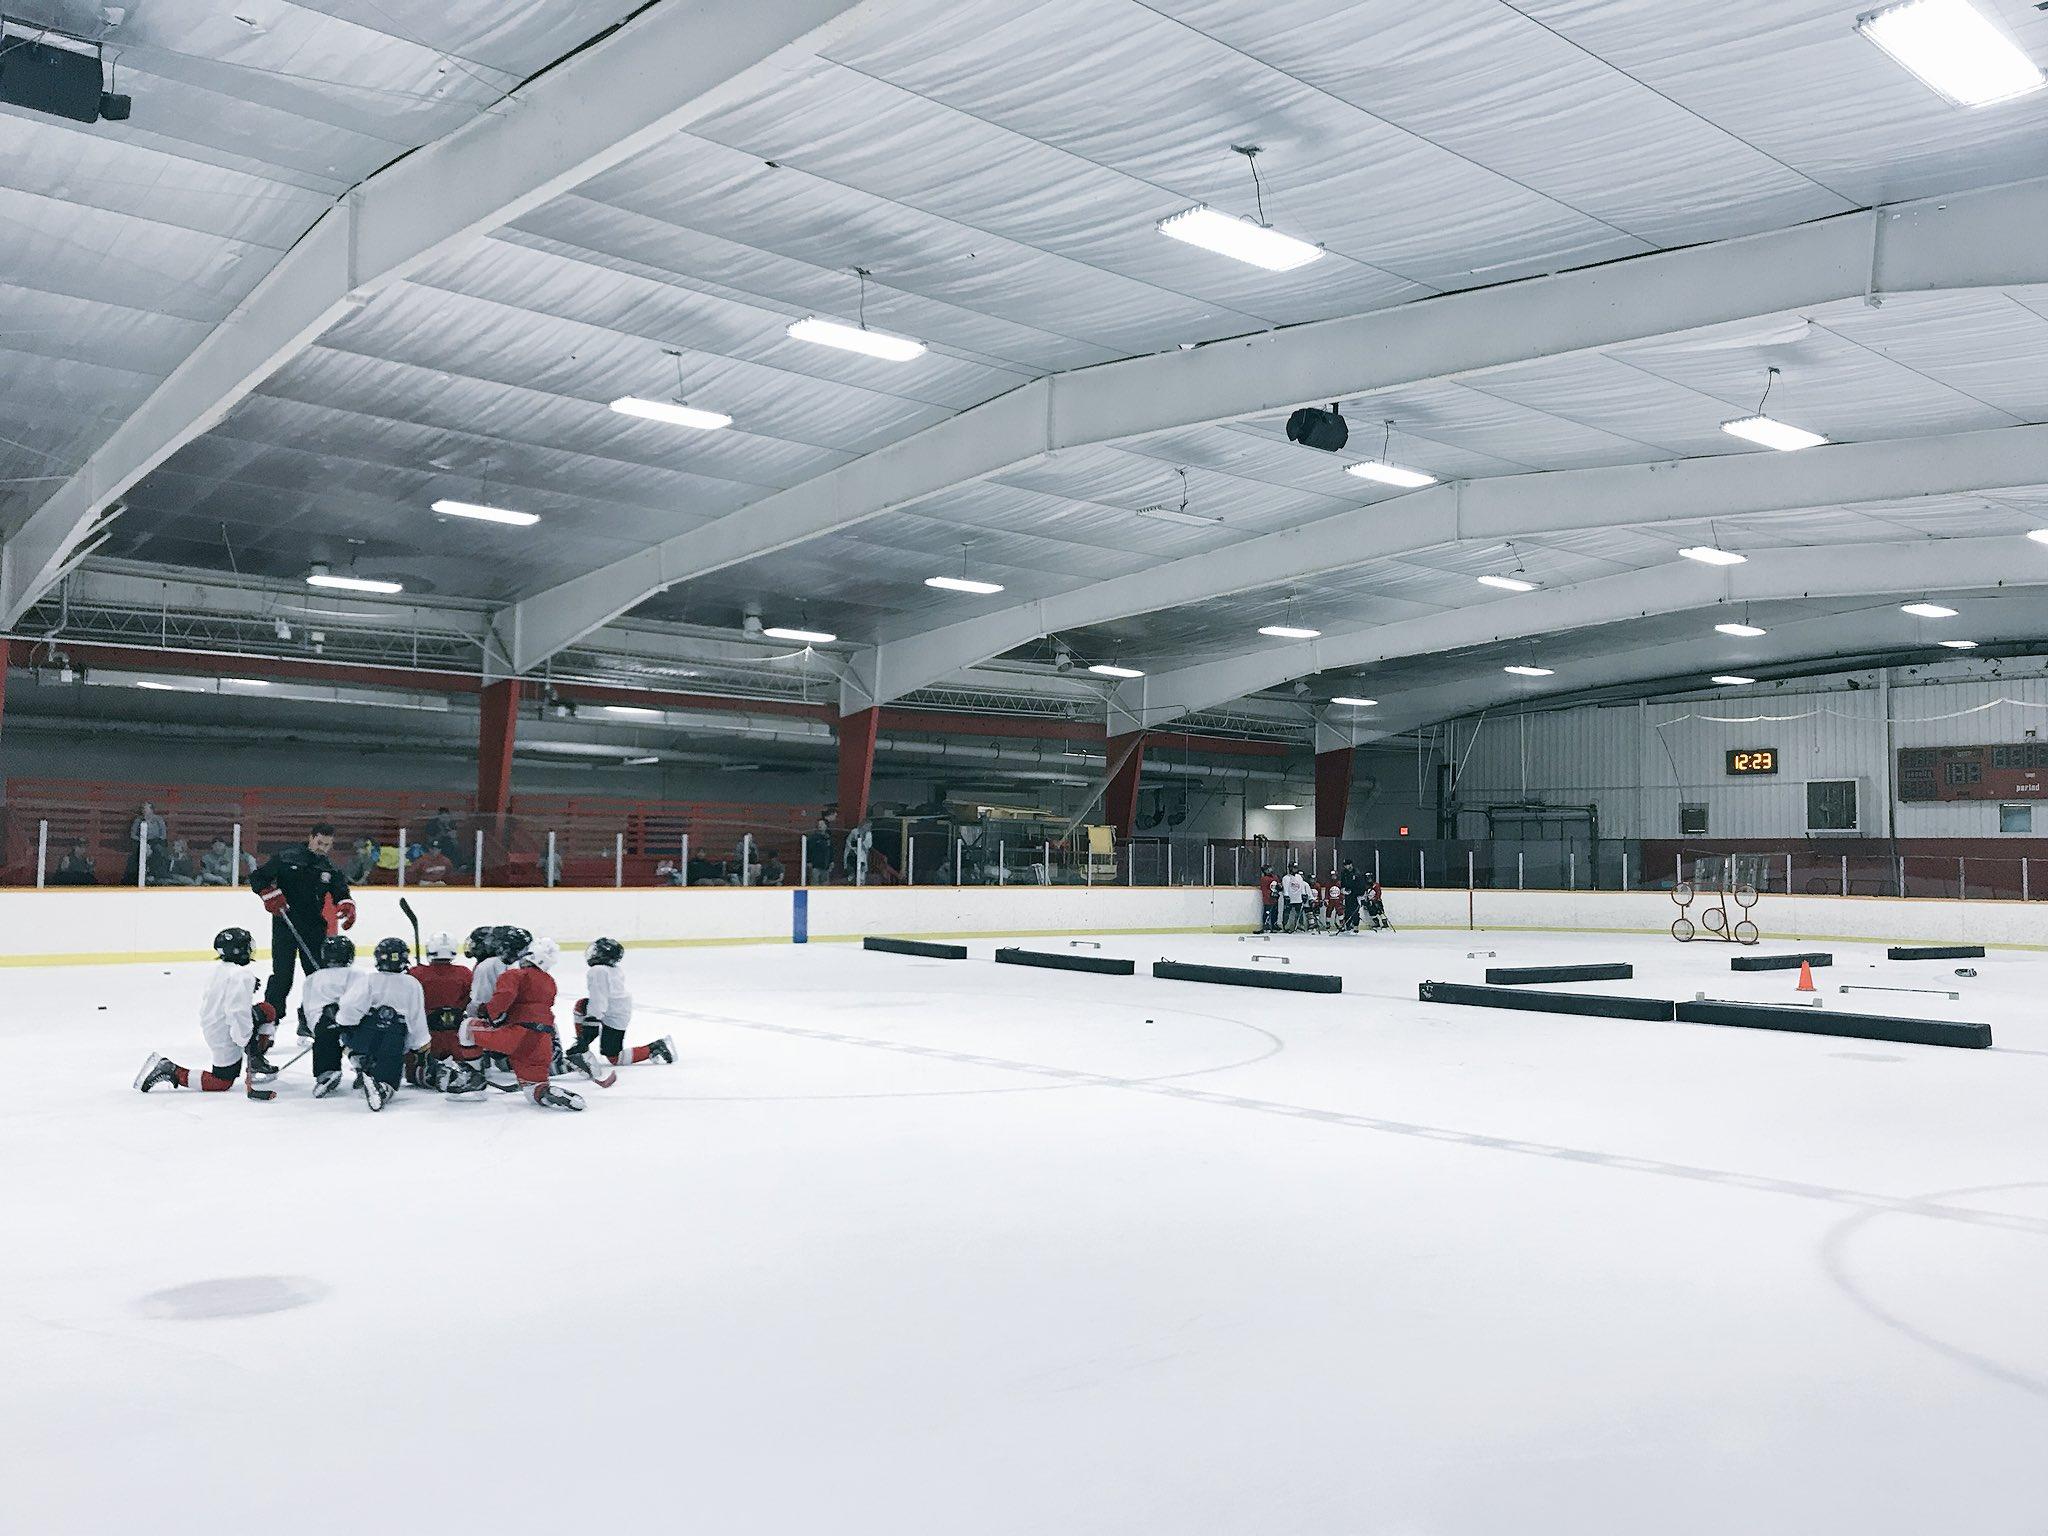 Gotta love summer hockey. #ForTheKids @LarkinHockey https://t.co/xOhKaA88FA